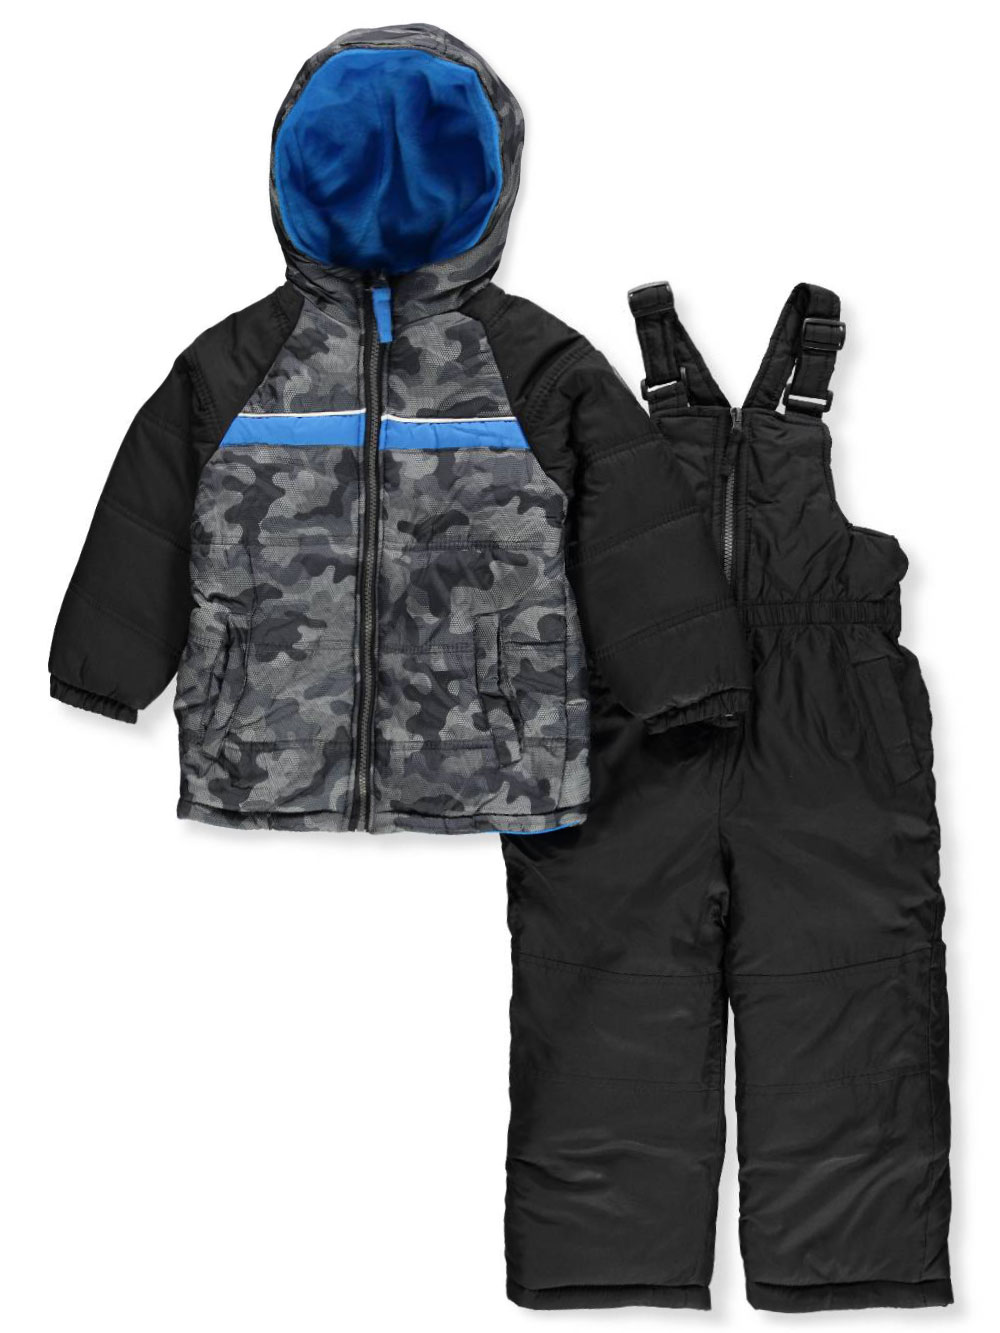 Camo Puffer Jacket Coat & Snowpants Ski Bib, 2pc Snowsuit Set (Baby Boys & Toddler Boys)